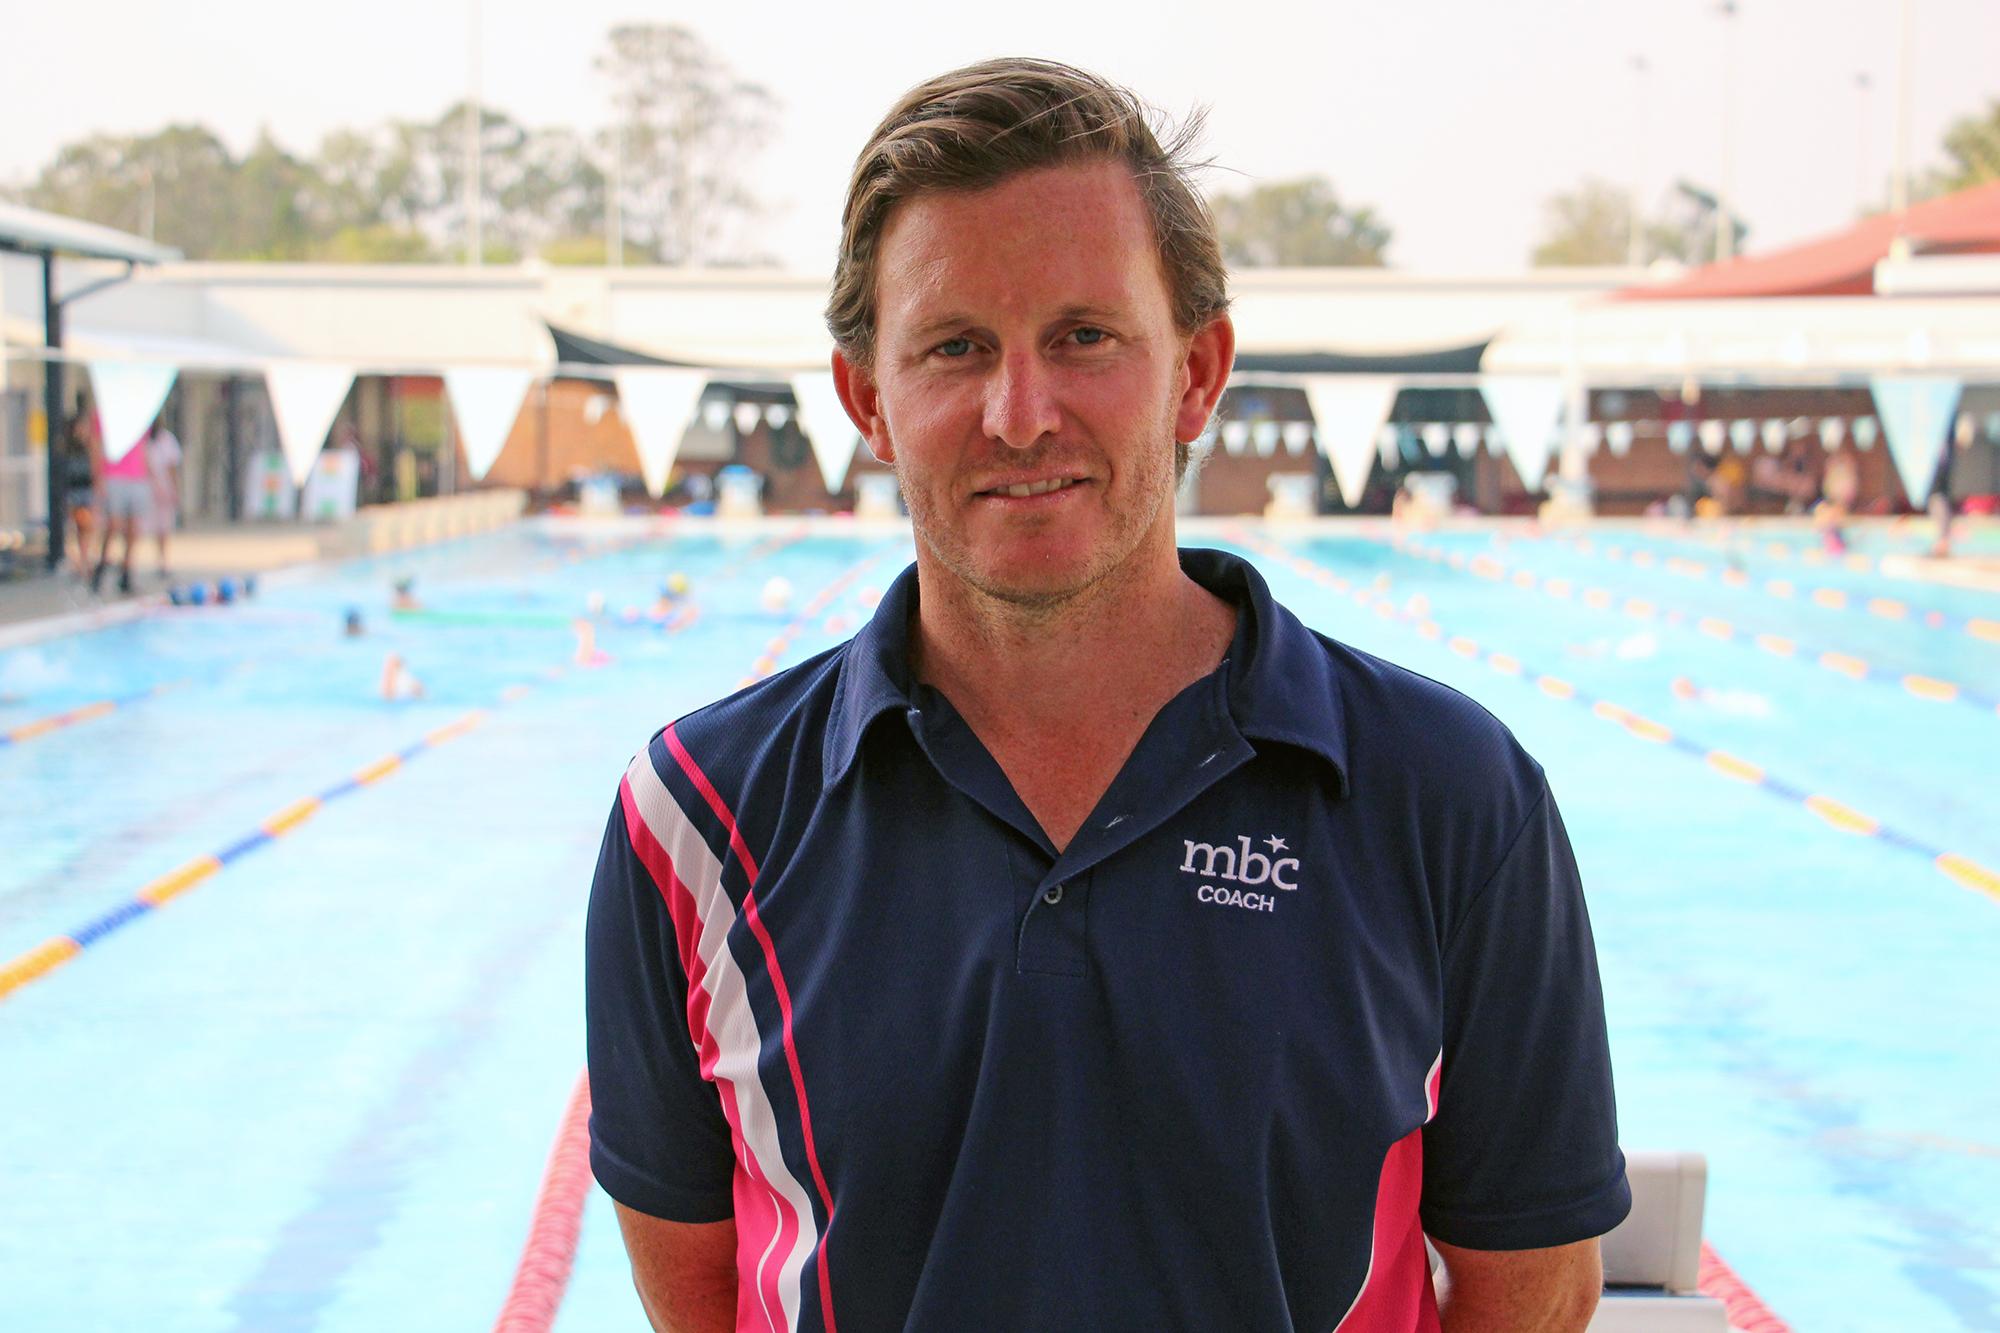 Acting Head Coach - Daniel Blackborrow